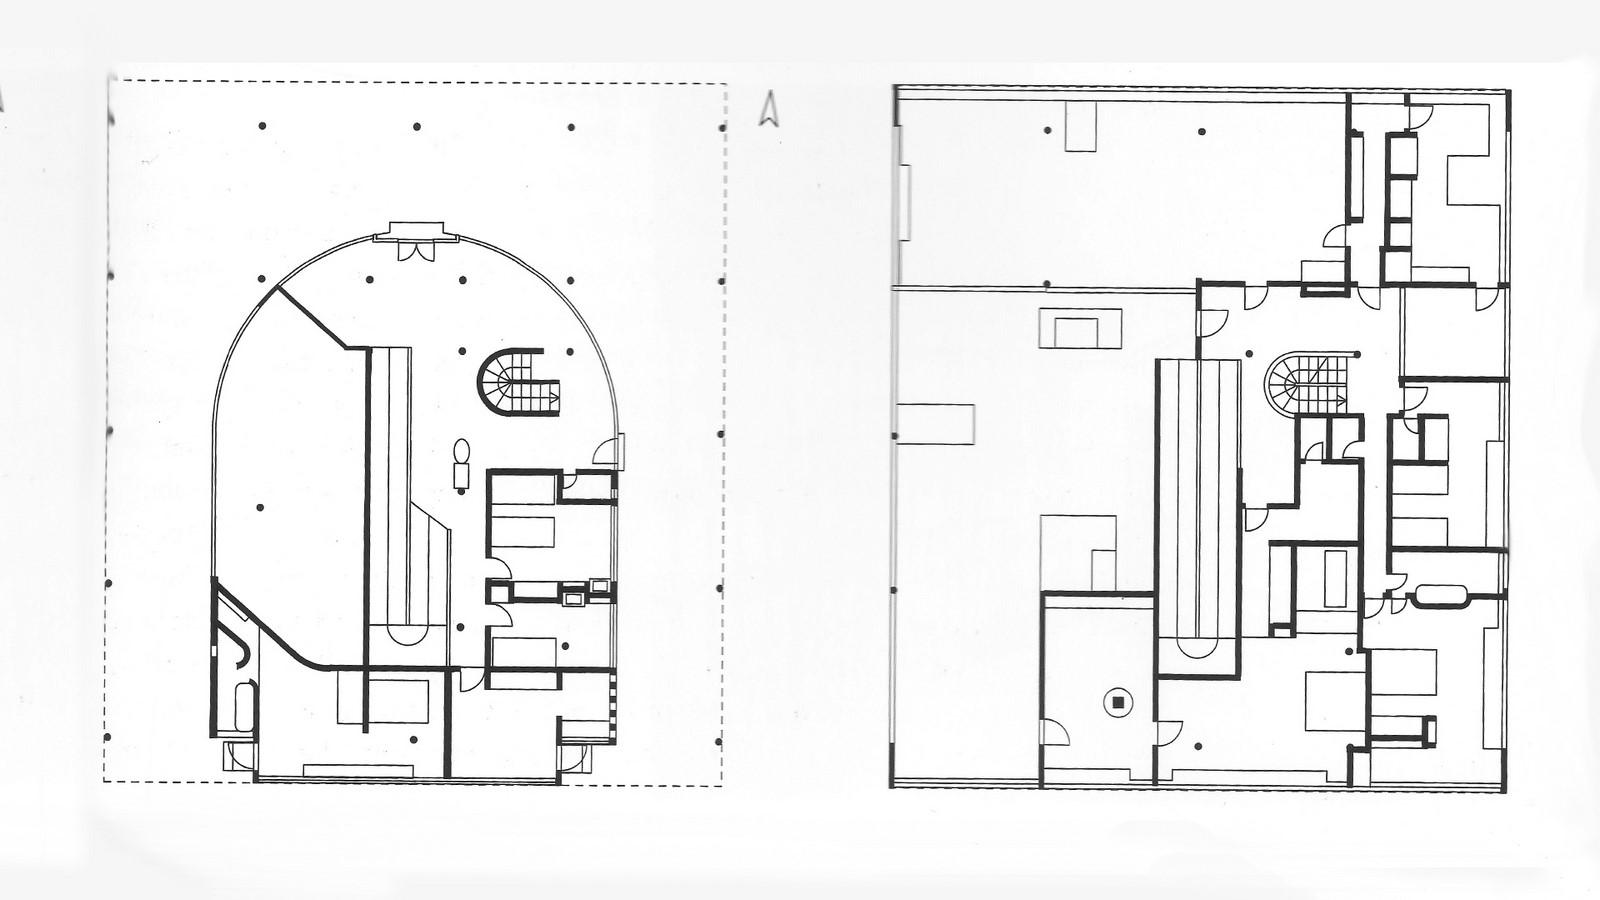 Villa Savoye, Paris, France by Le Corbusier - Sheet3